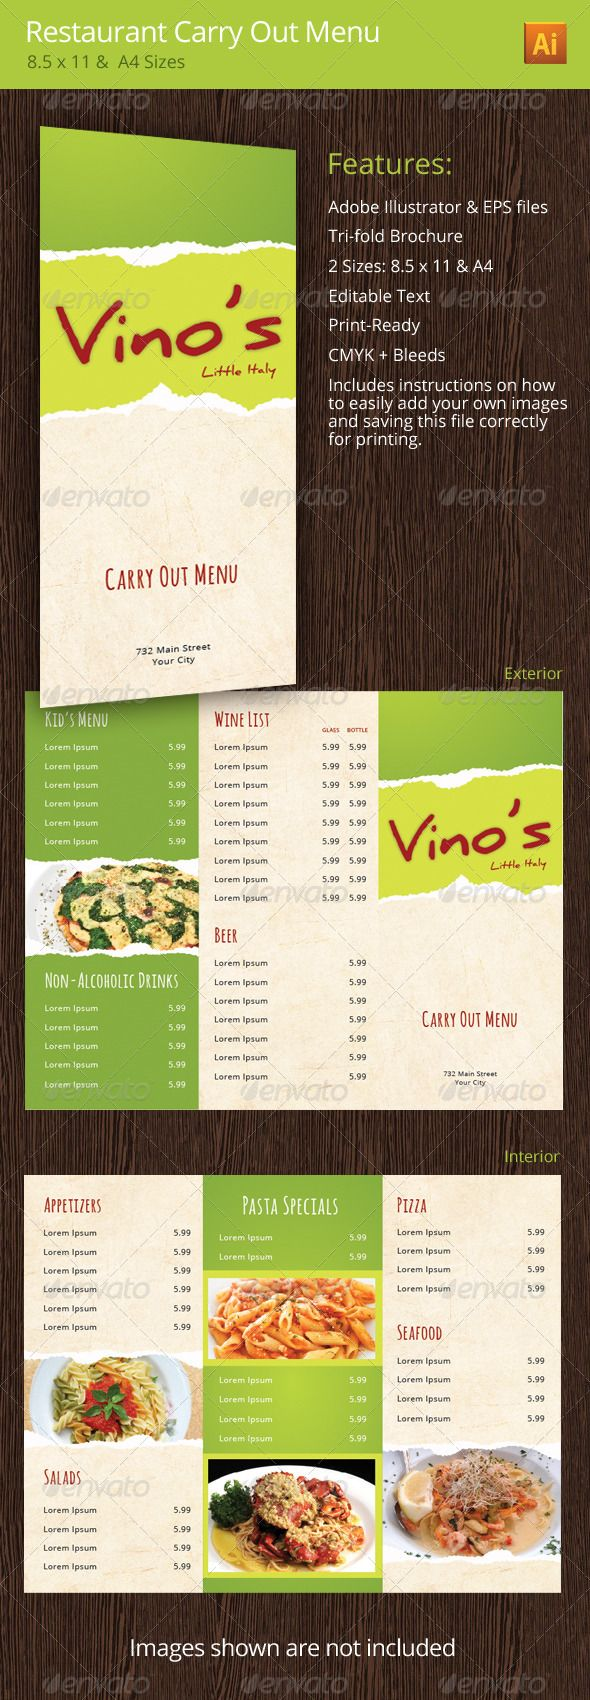 restaurant take out menu templates